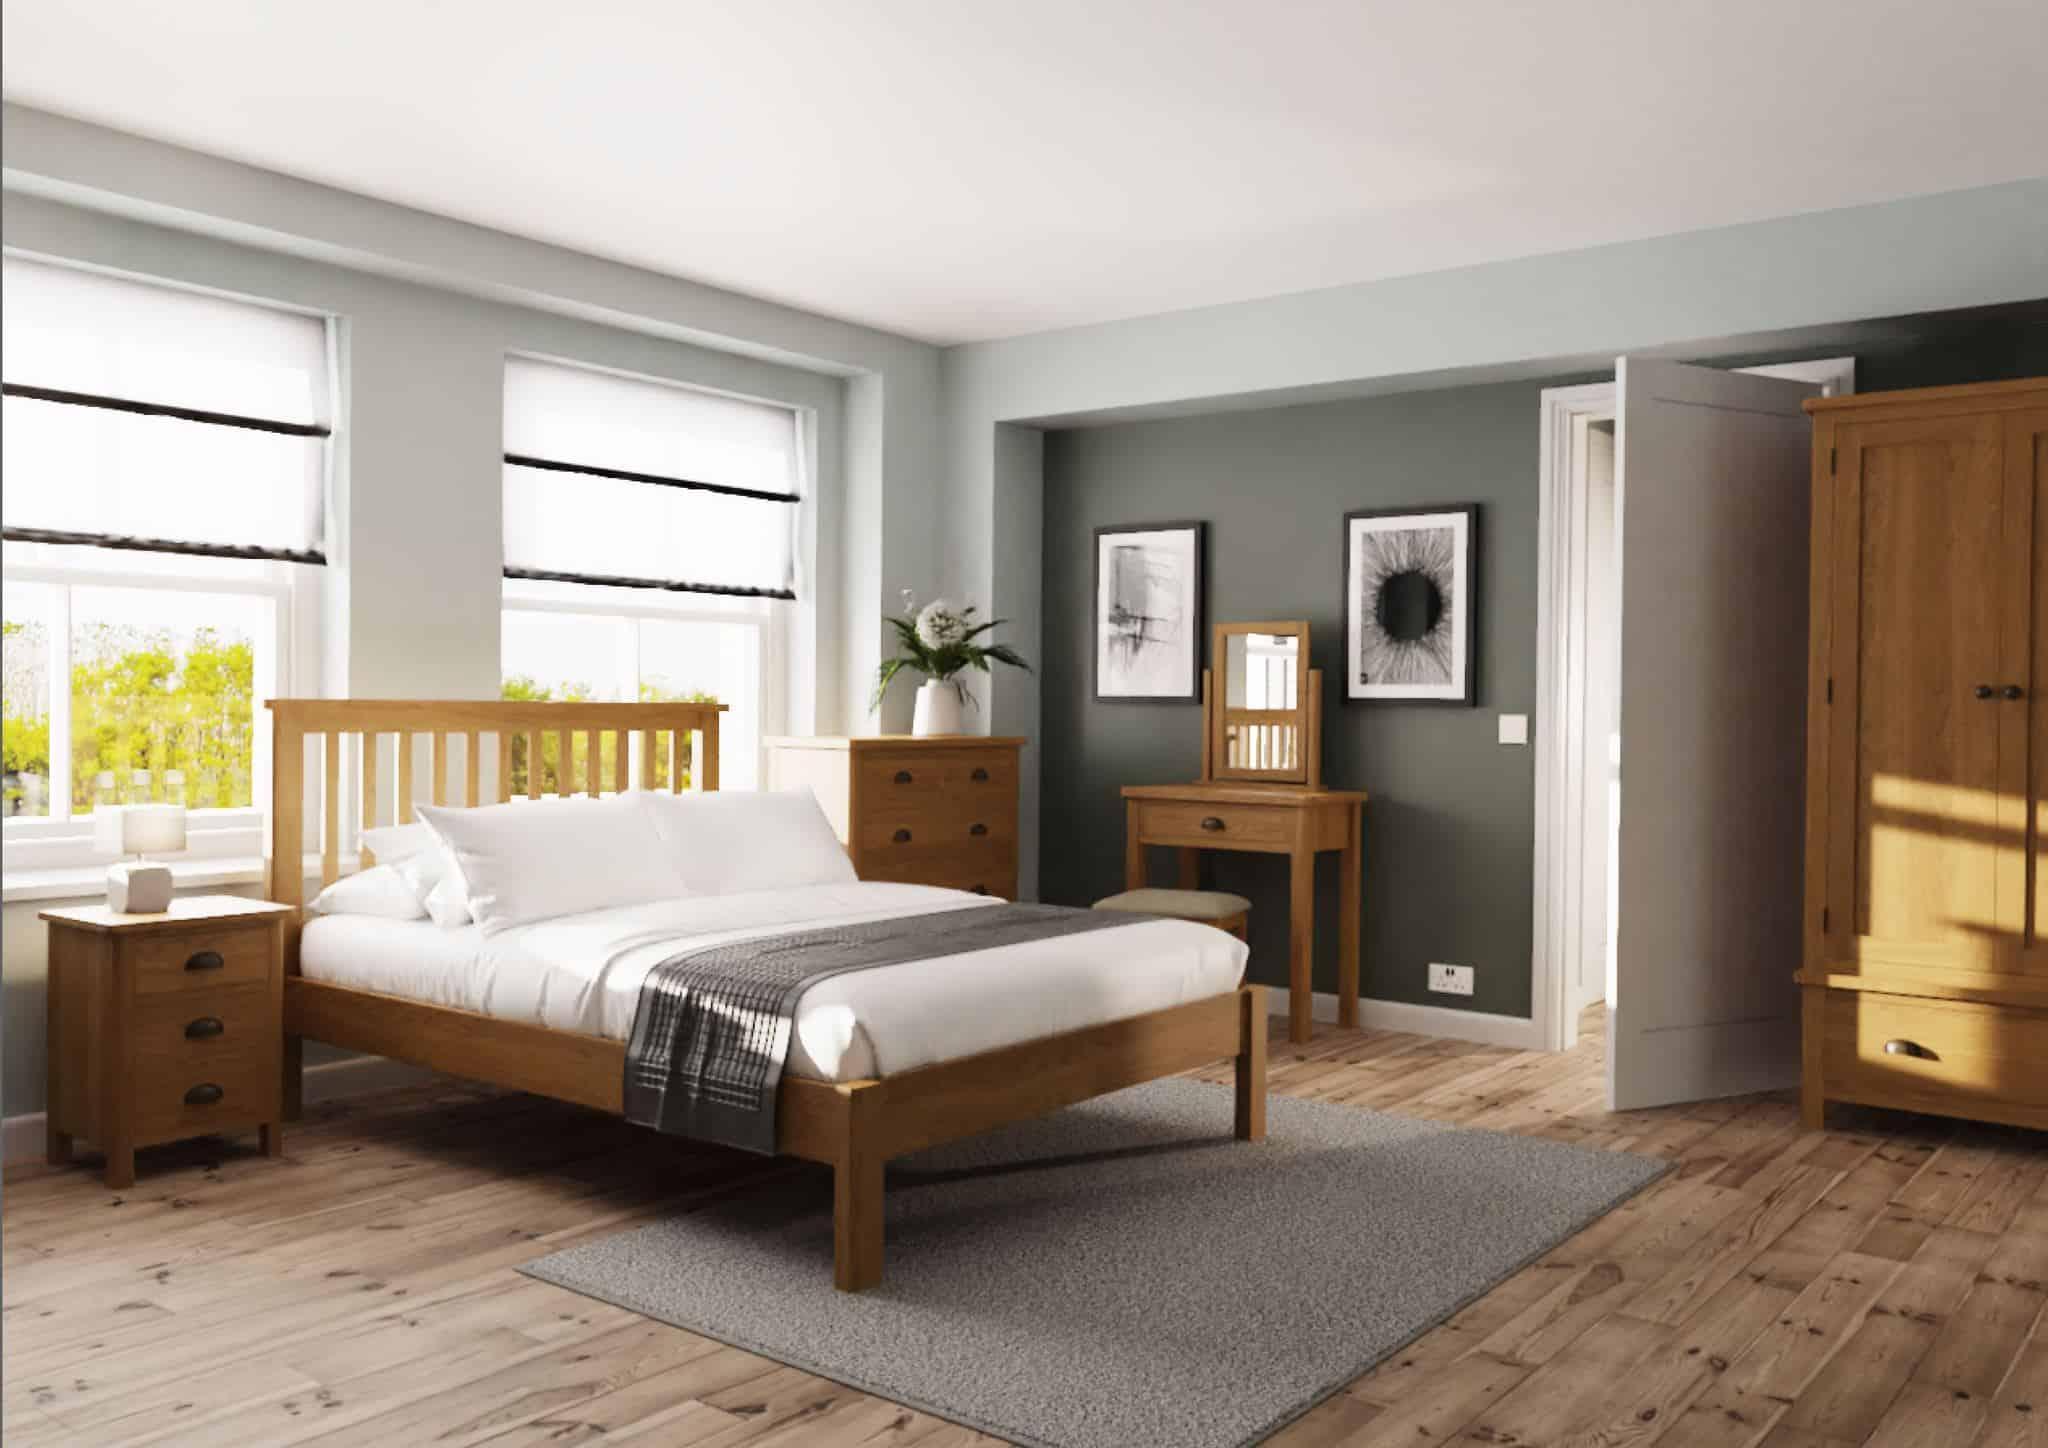 ki19 100d bedroom roomset